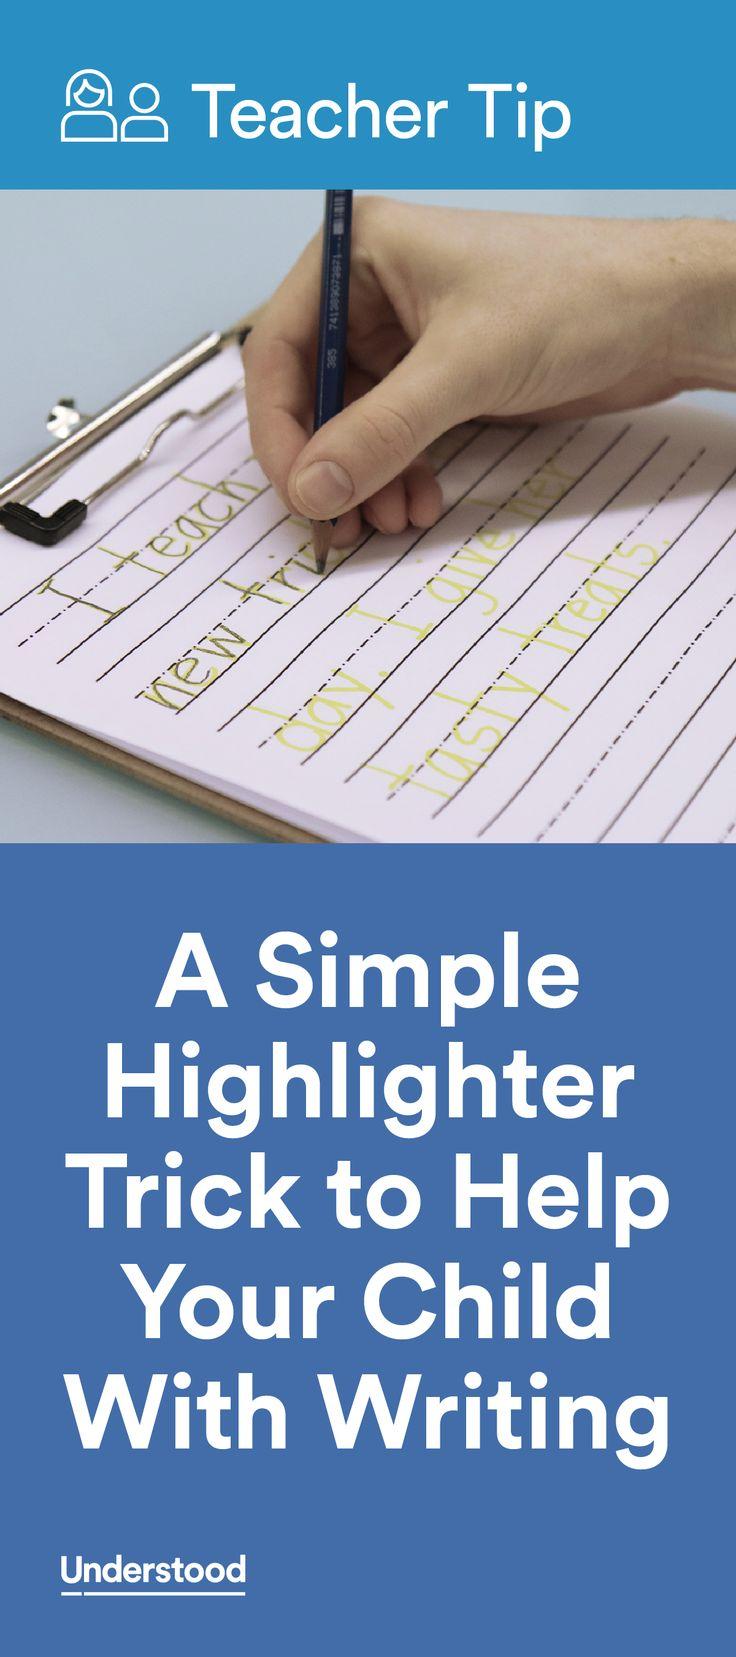 16 best Teacher Tips images on Pinterest | Teacher tips, Dyslexia ...